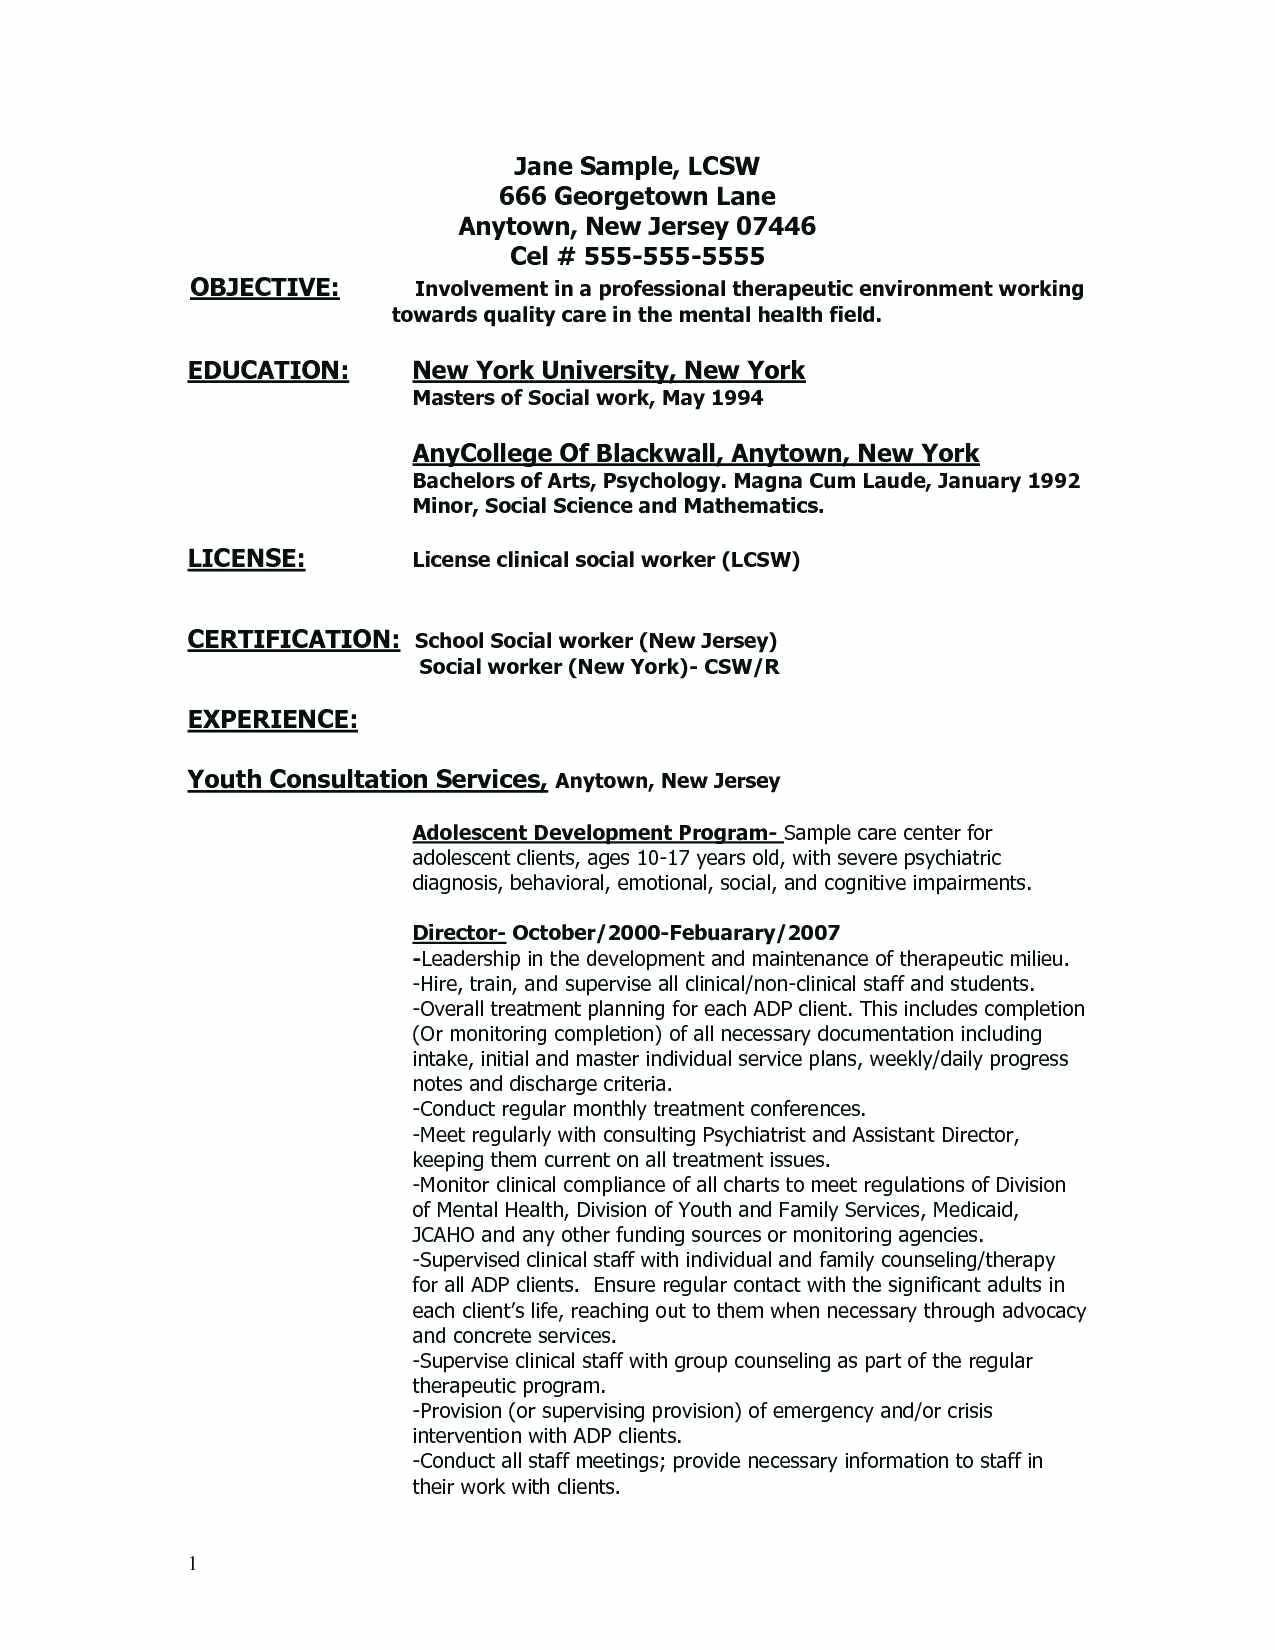 Accounting Internship Resume Objective Beautiful Resume